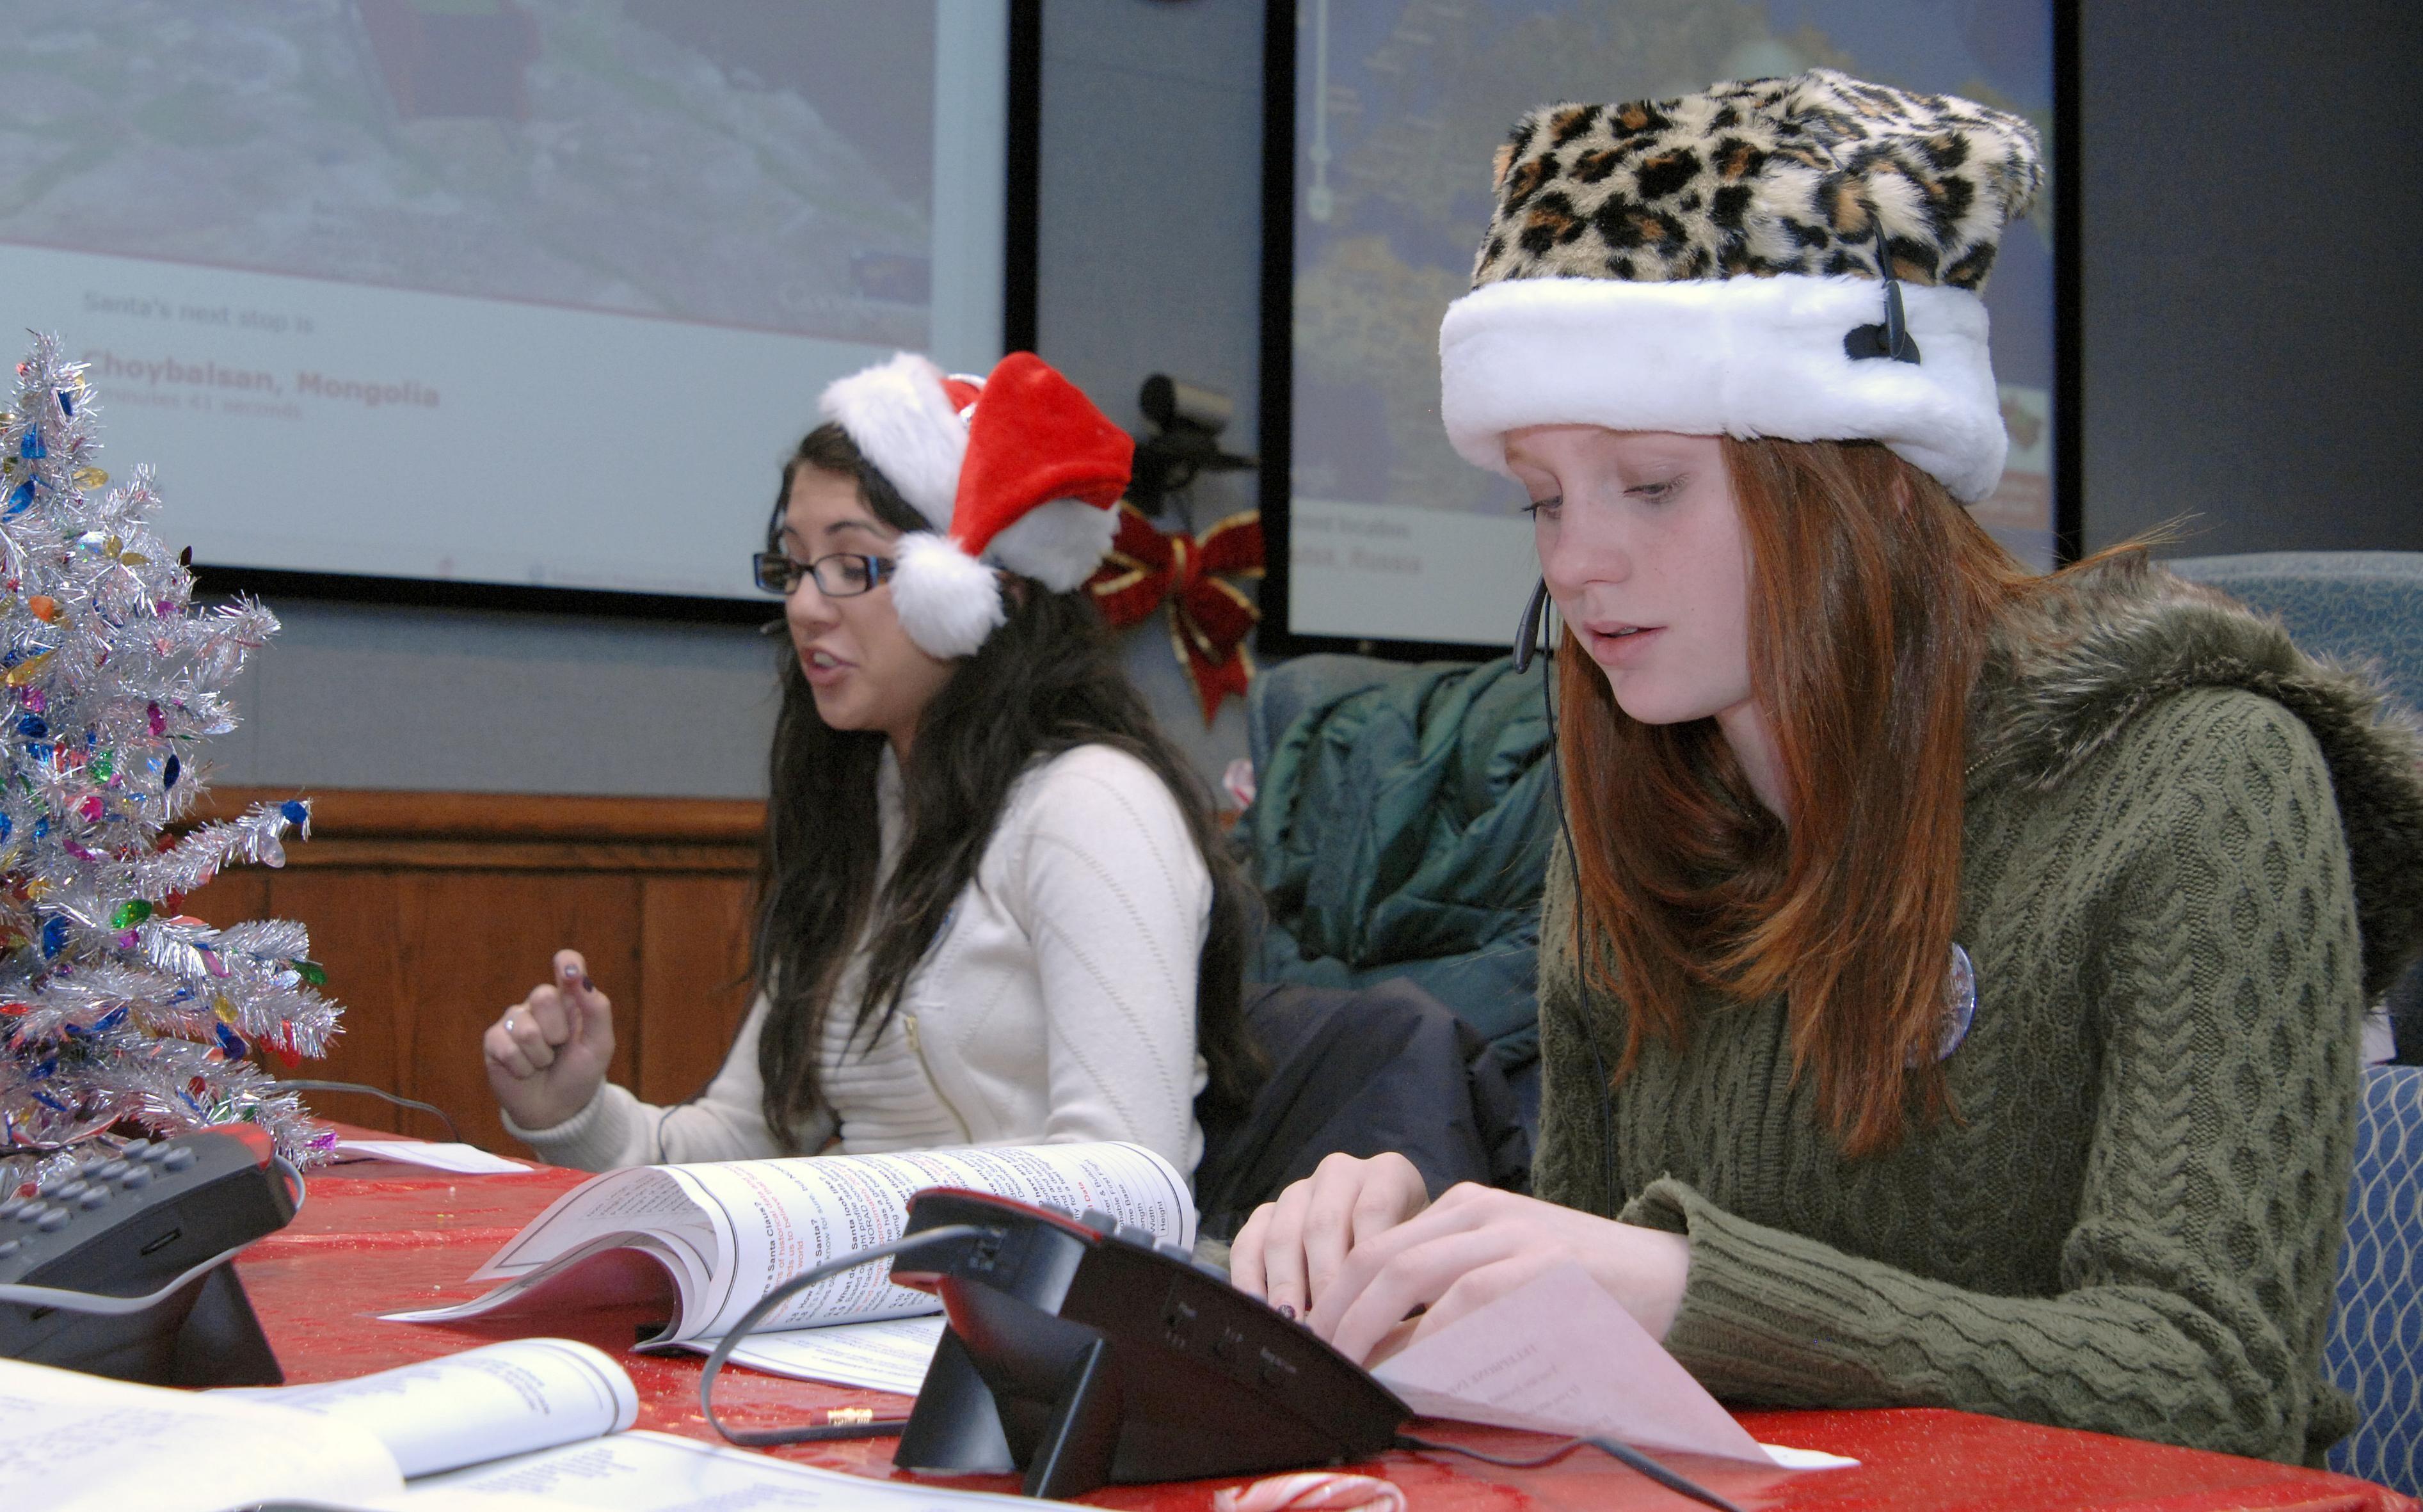 NORAD Tracks Santa Program has record-breaking success in 2011 ...